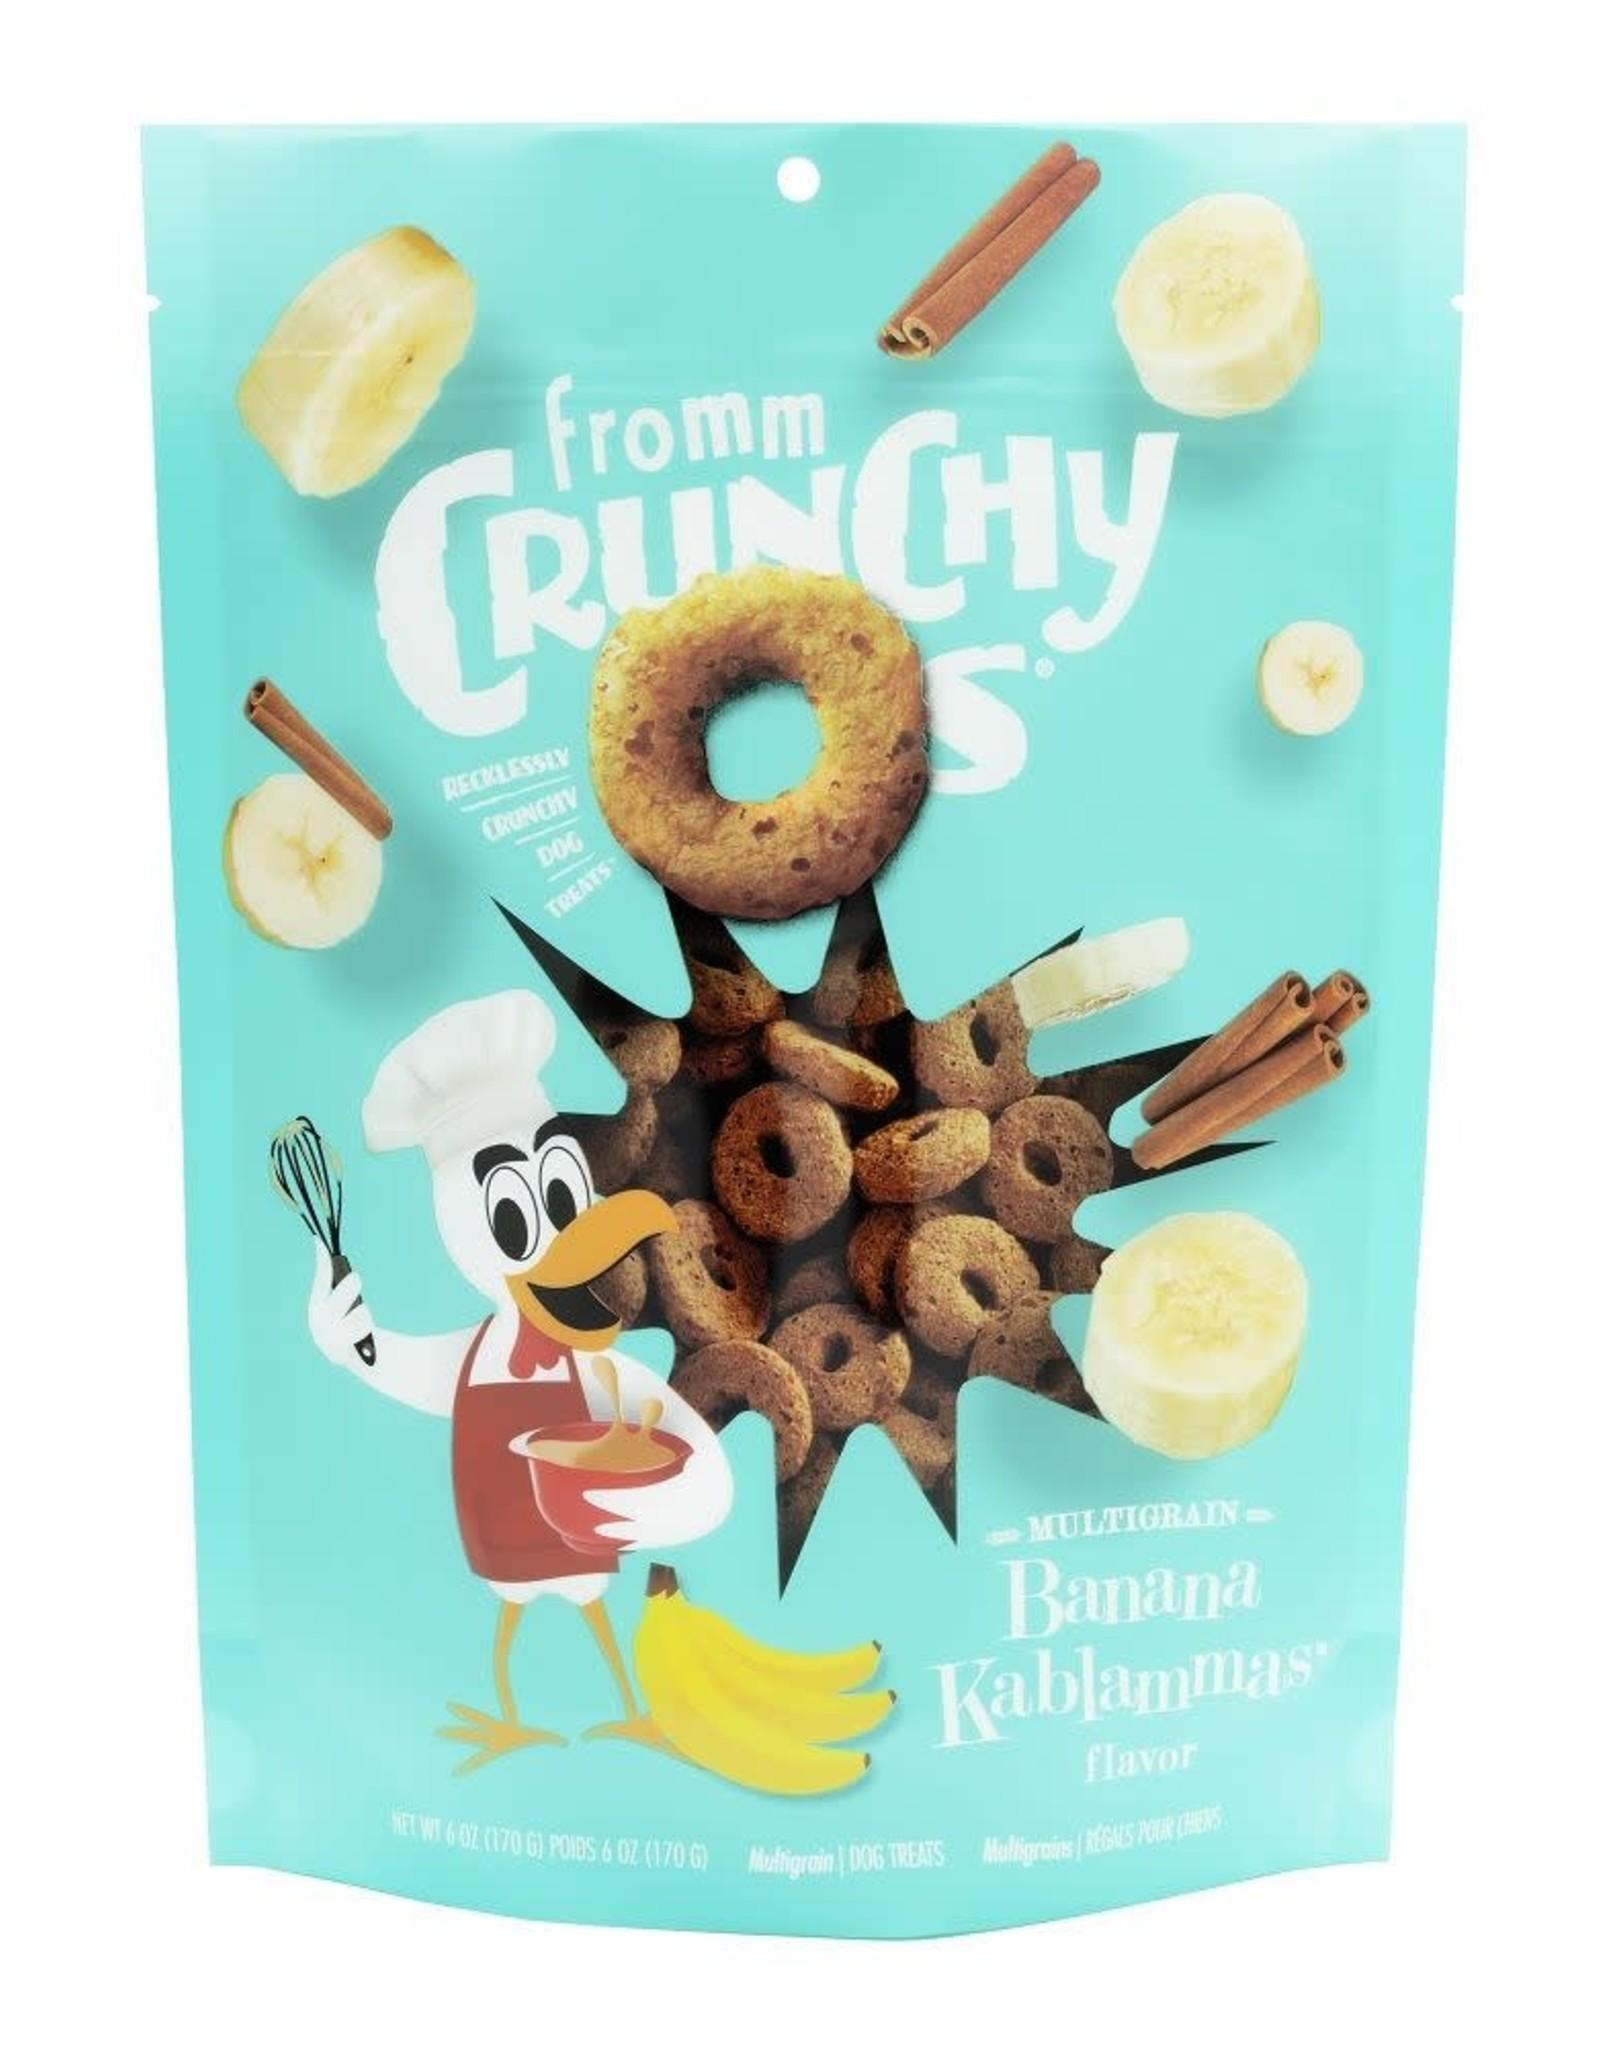 Fromm Fromm Crunchy O's Banana Kablammas 170g